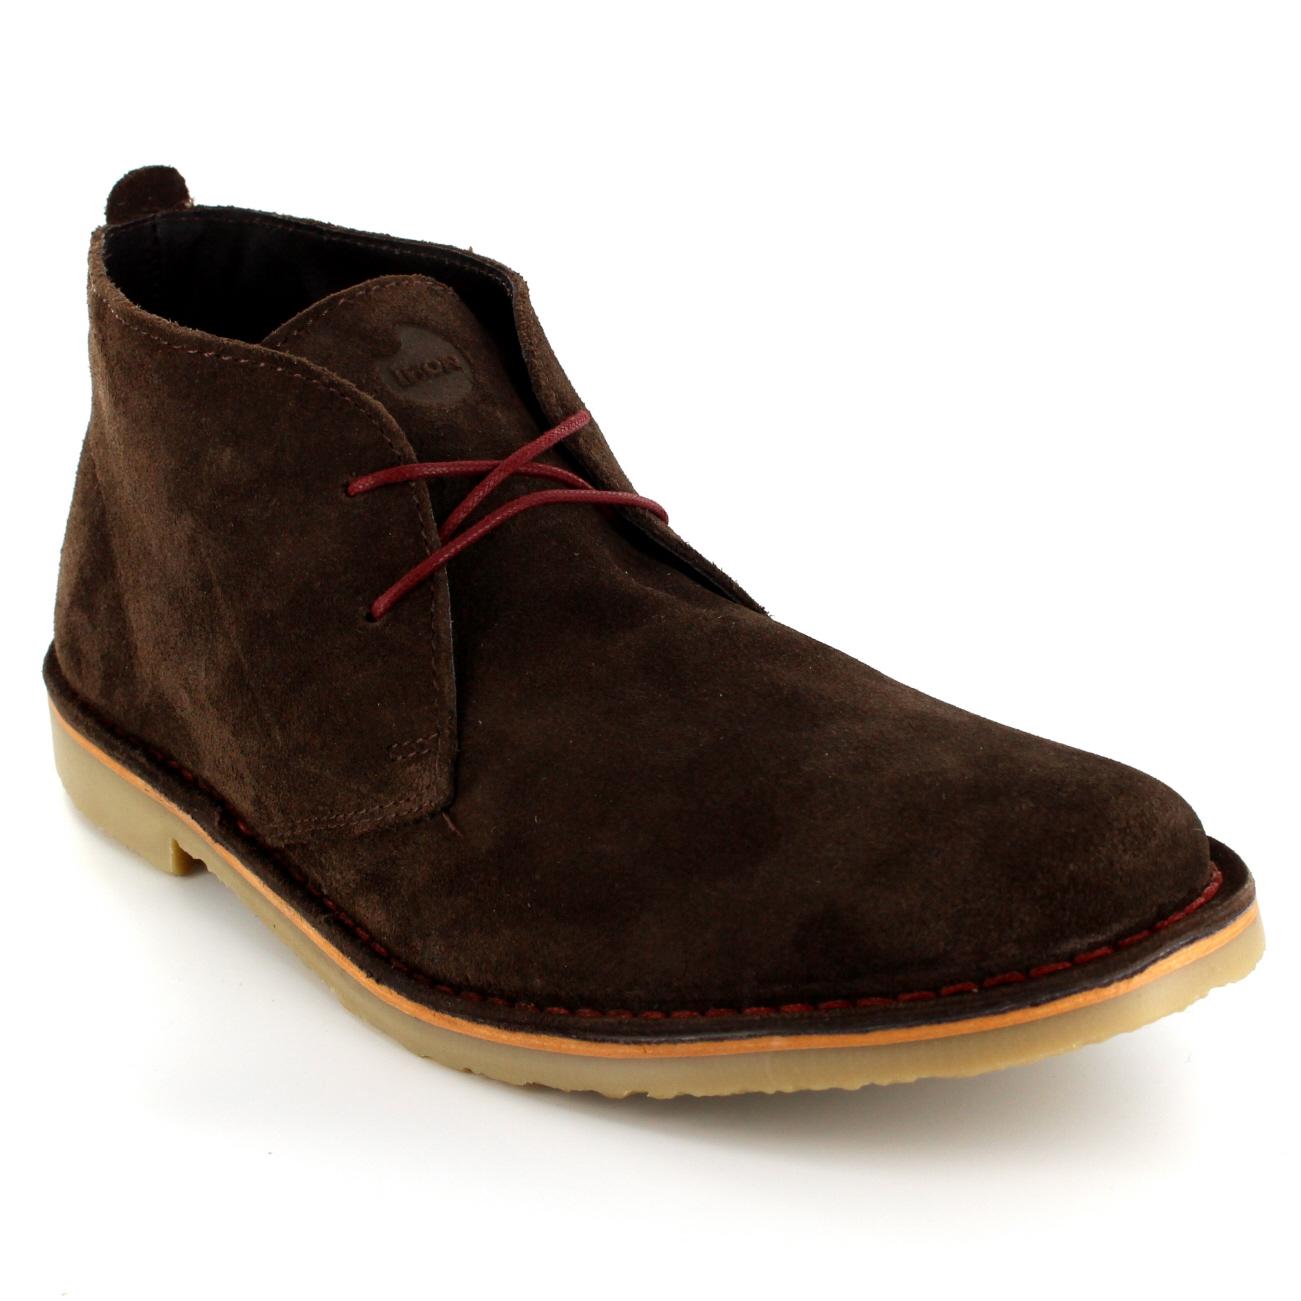 Ikon A.K Chukka Boots